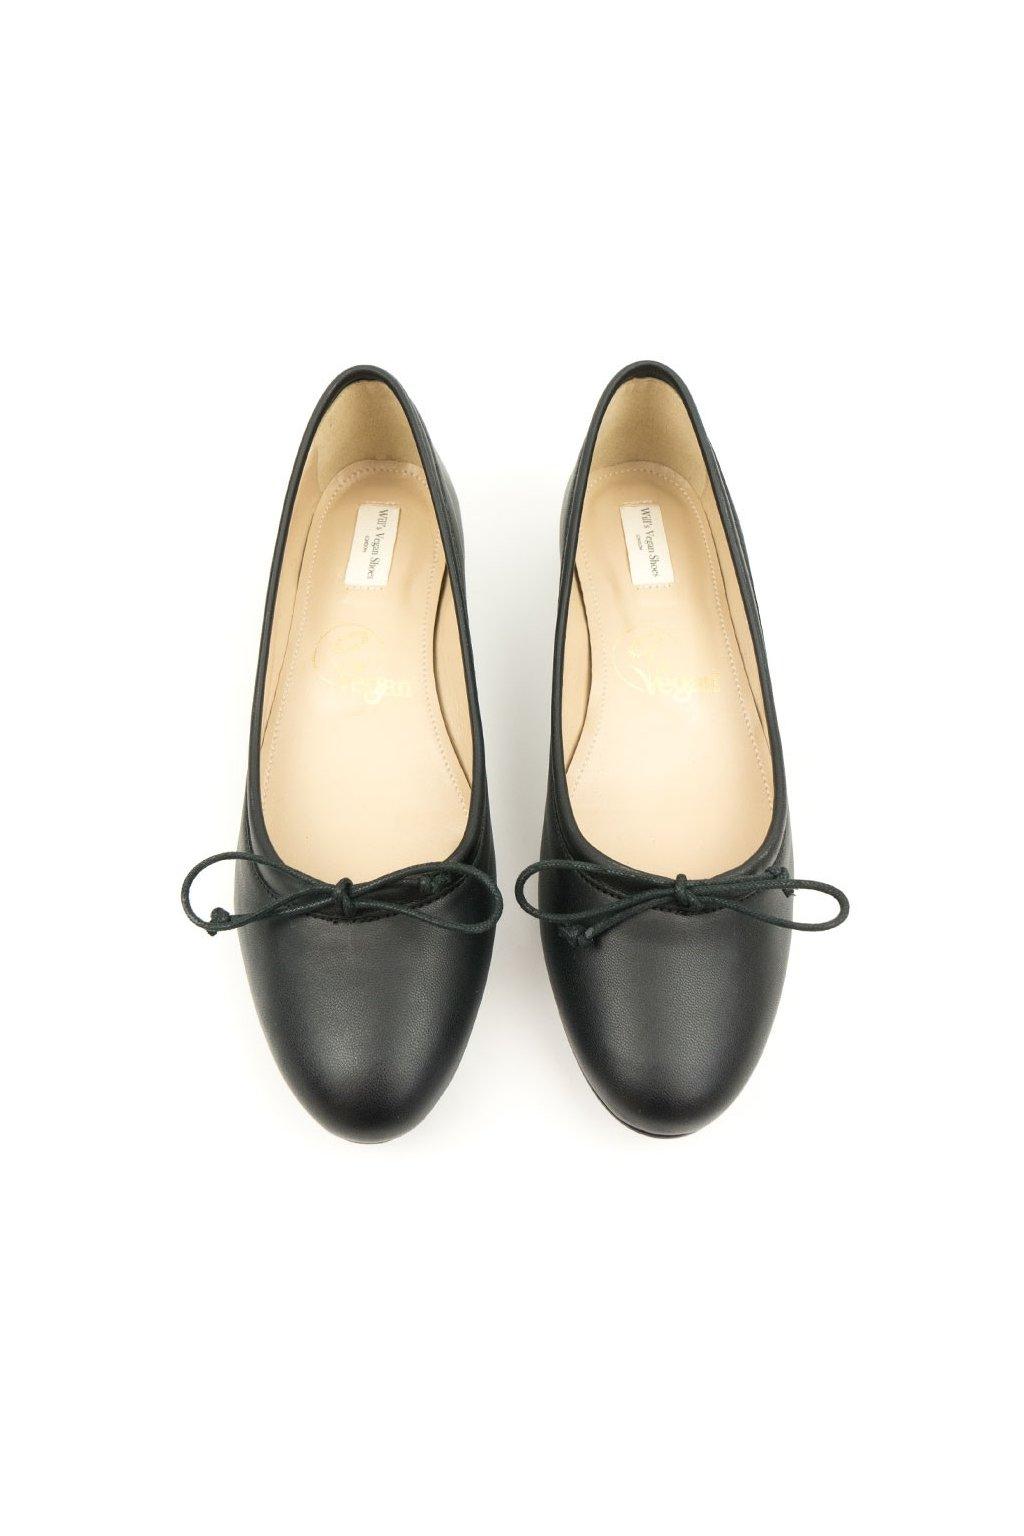 "Dámske čierne balerínky ""Ballerina Flats"""